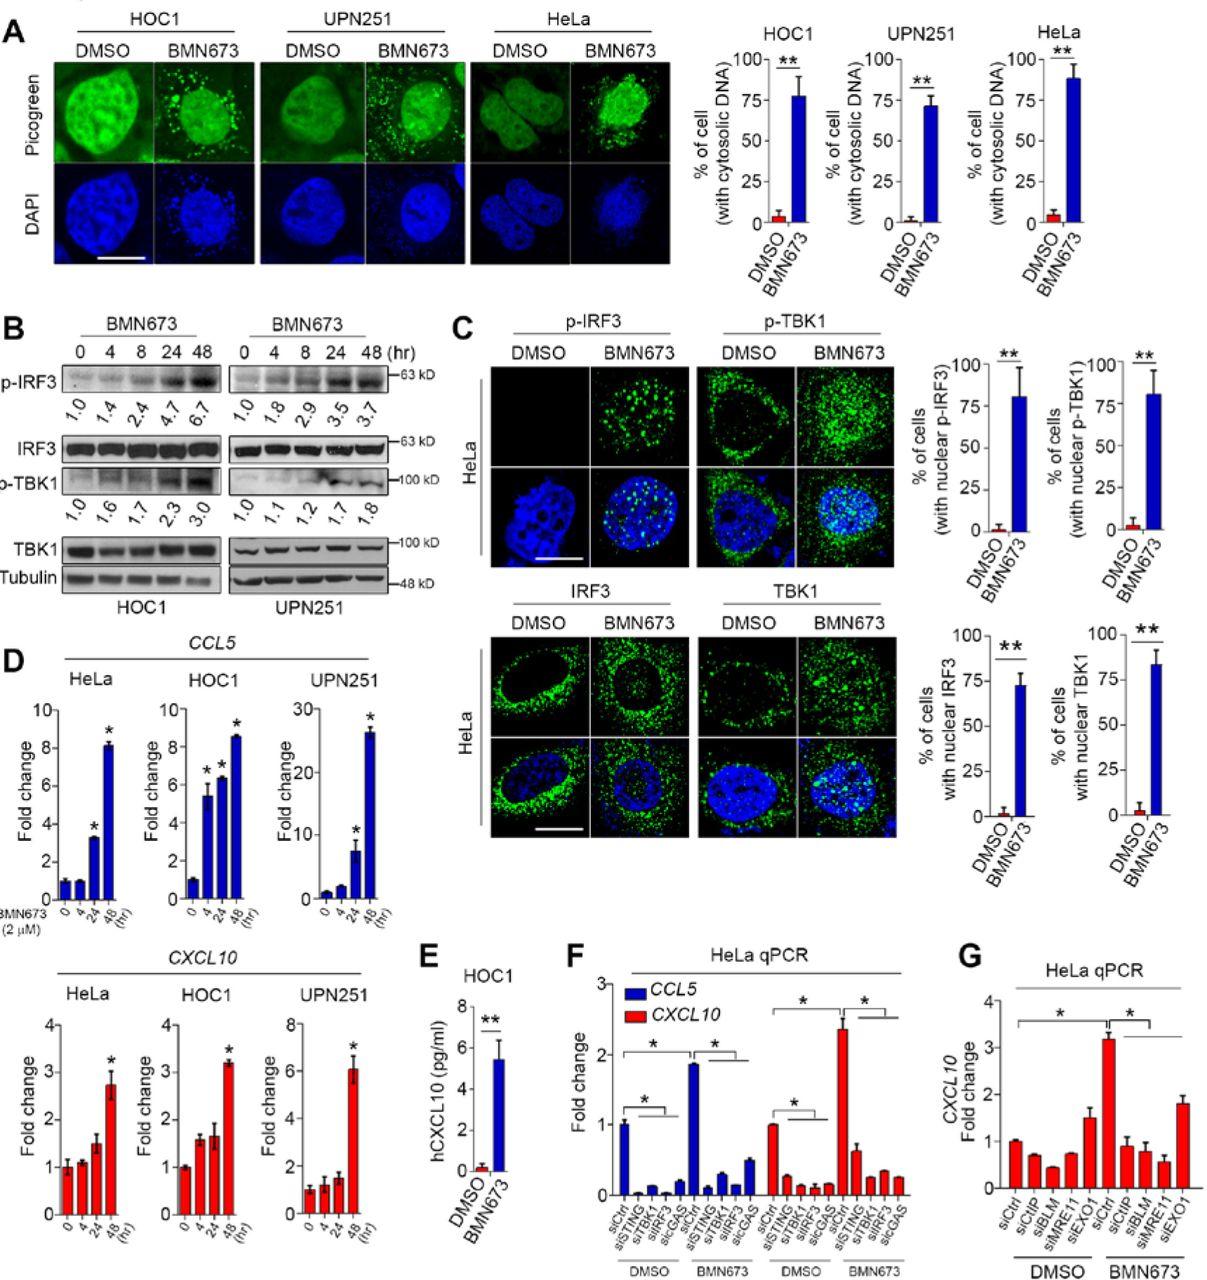 PARPi triggers STING-dependent immune response and enhances